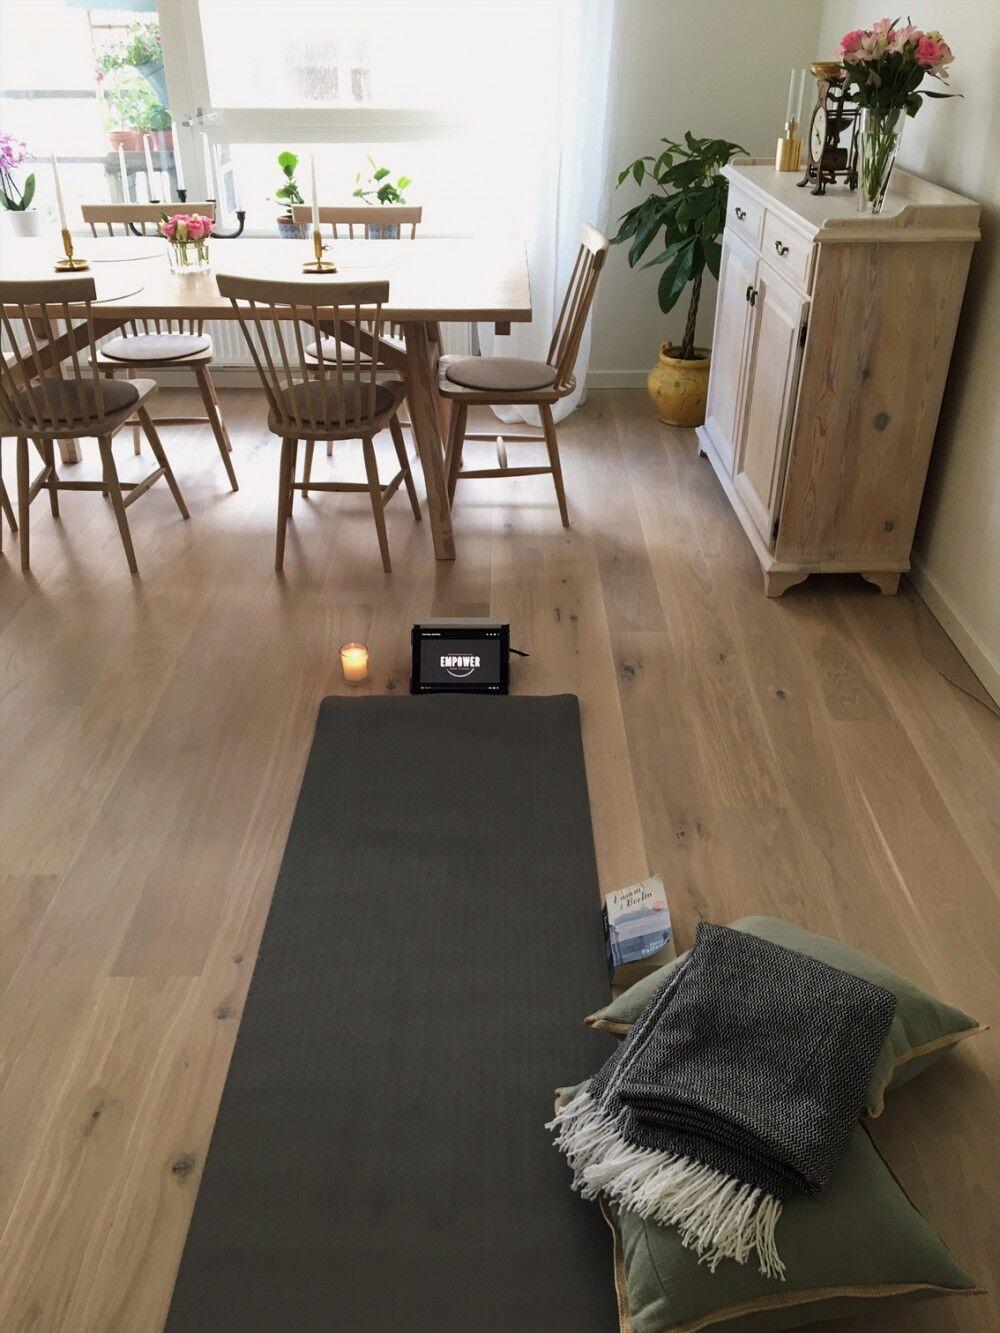 Yoga hemma i vardagsrummet.